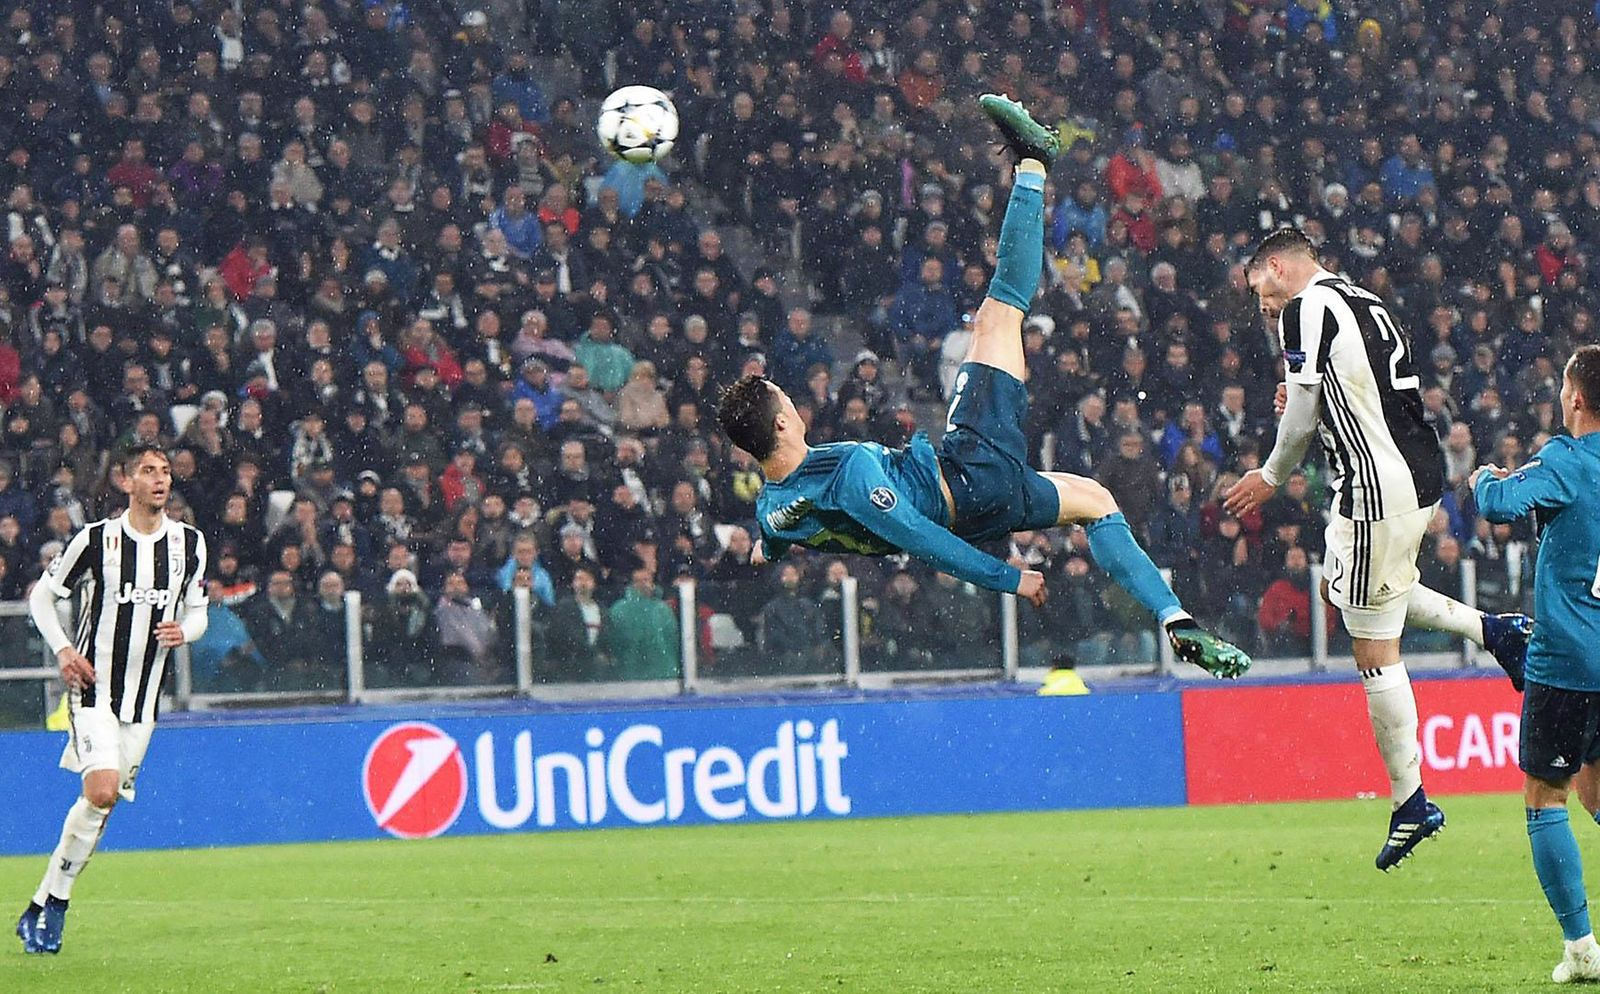 Fallrückzieher / Ronaldo 2018